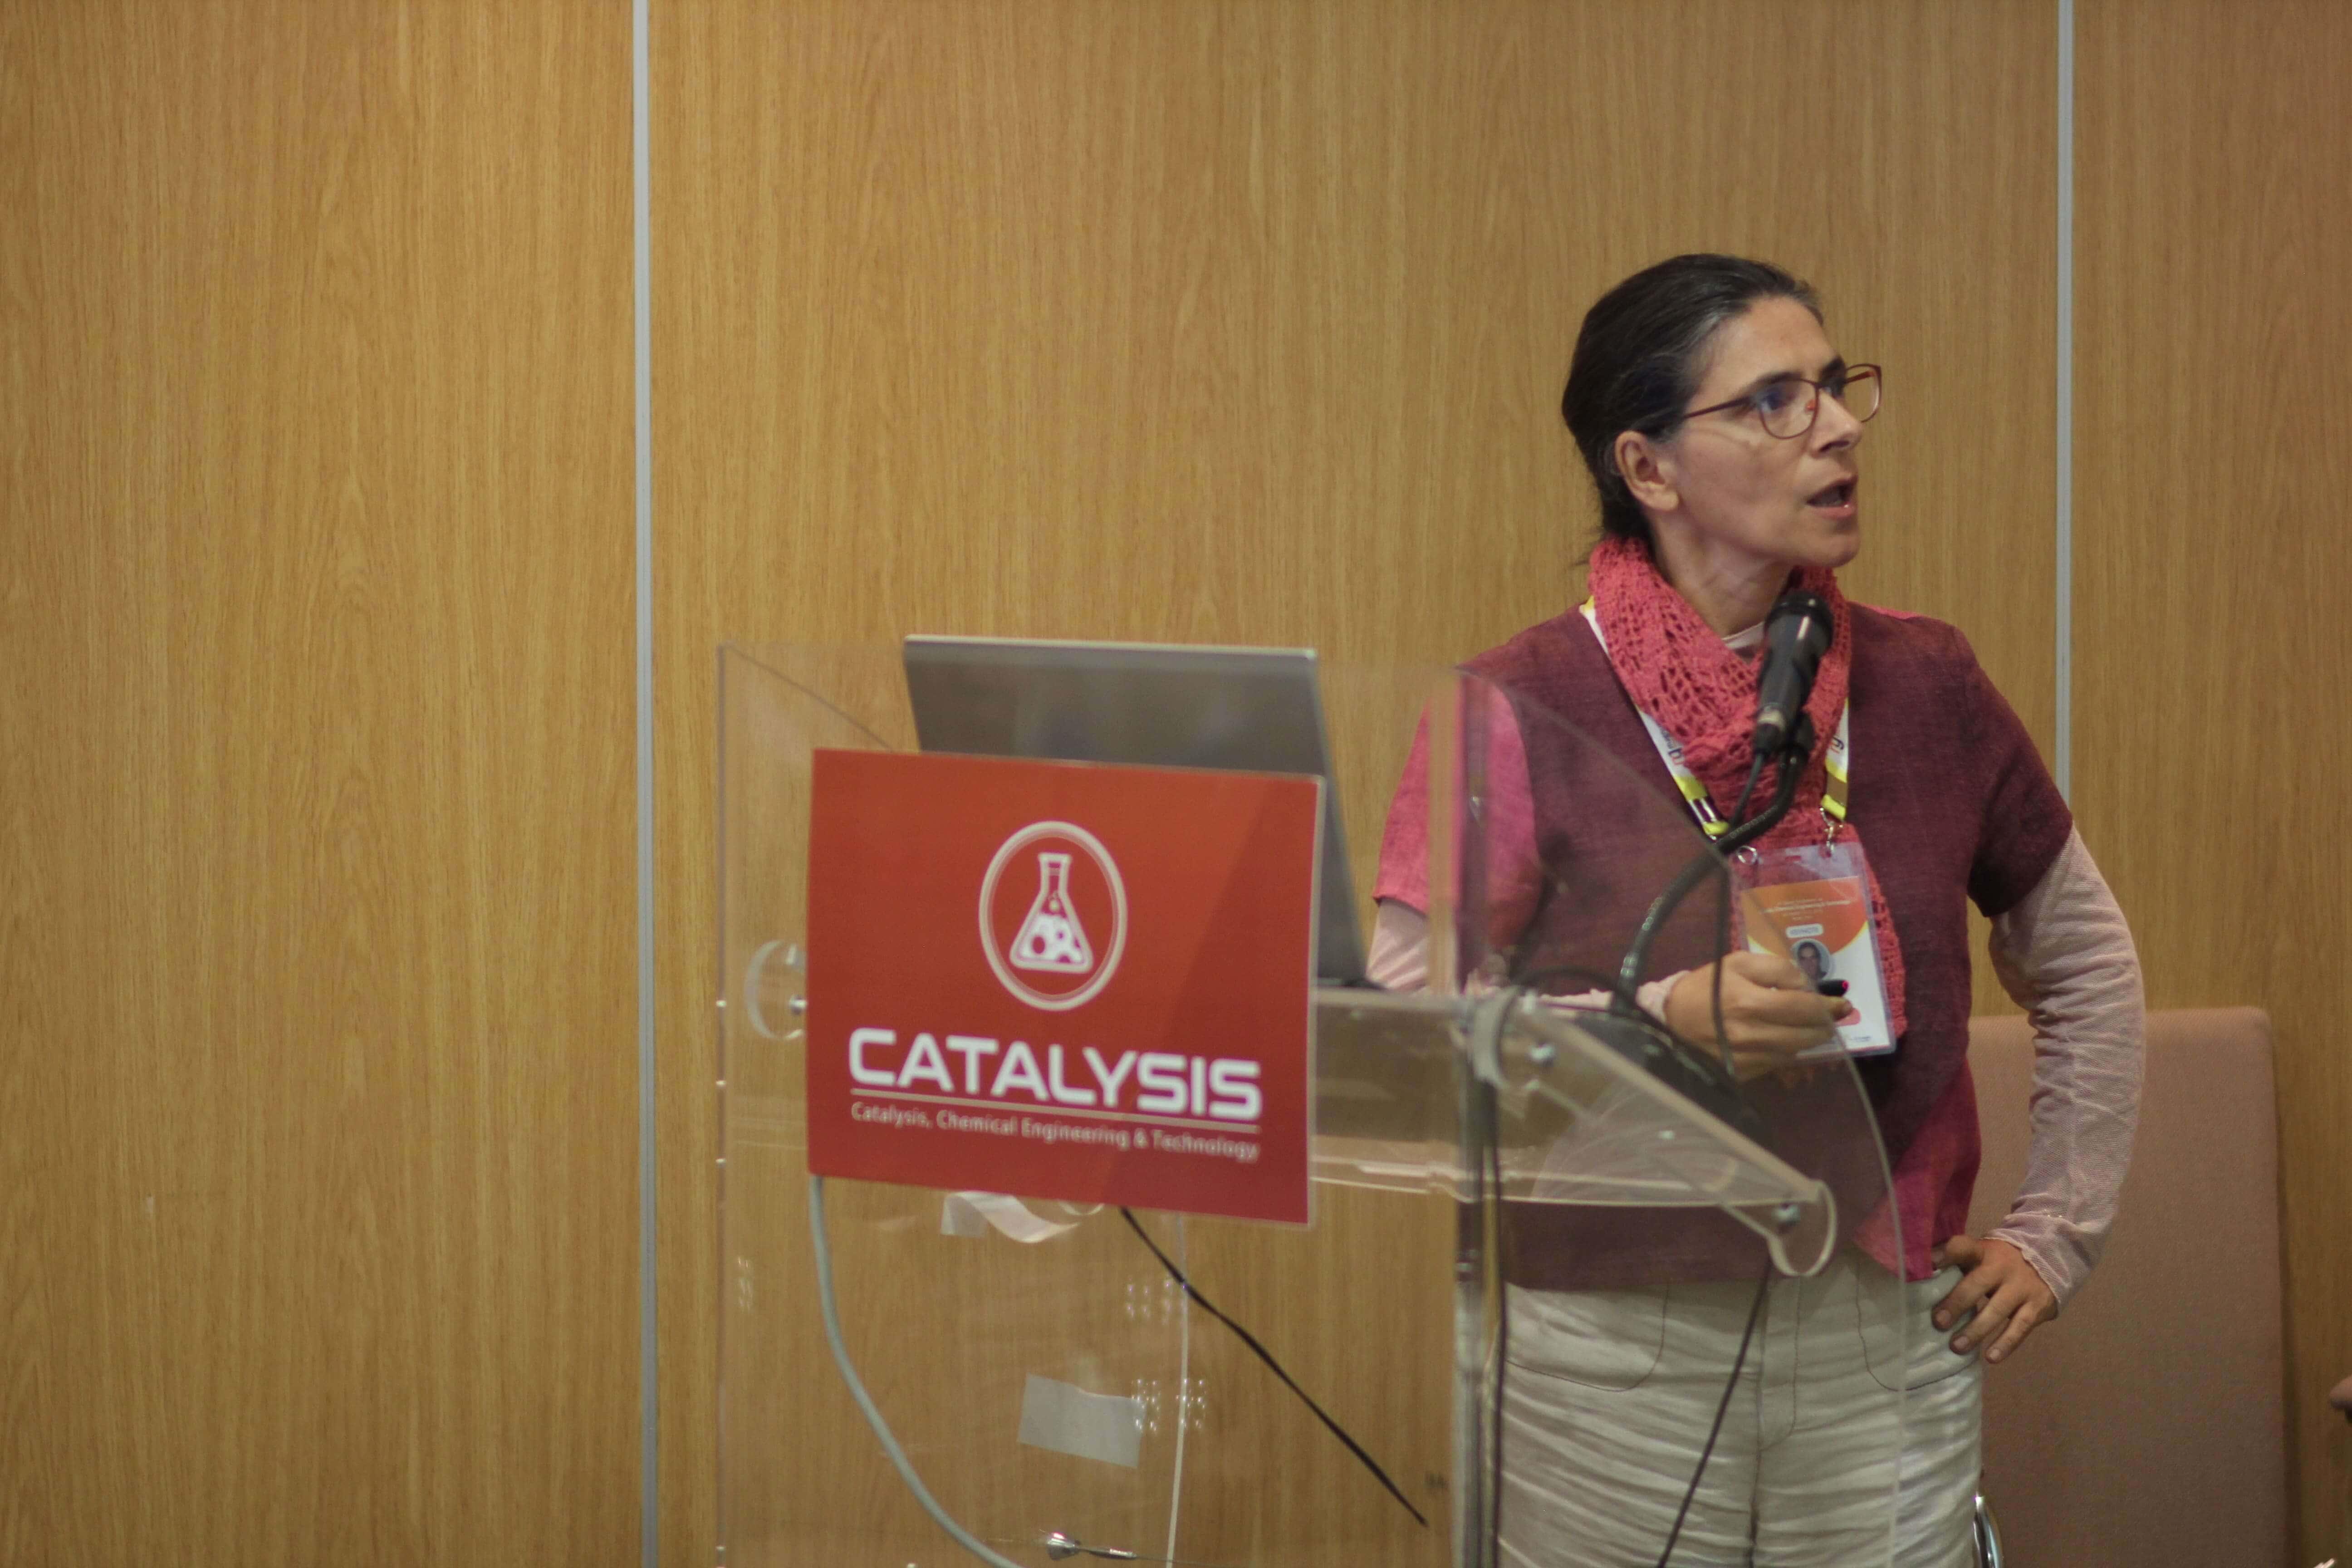 Valérie Meille, University of Lyon, France